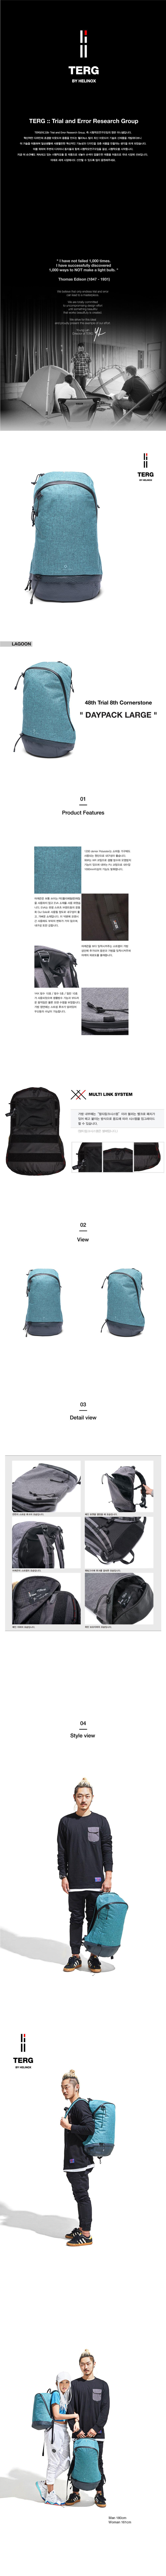 20160428_Daypack-Large-lagoon.jpg